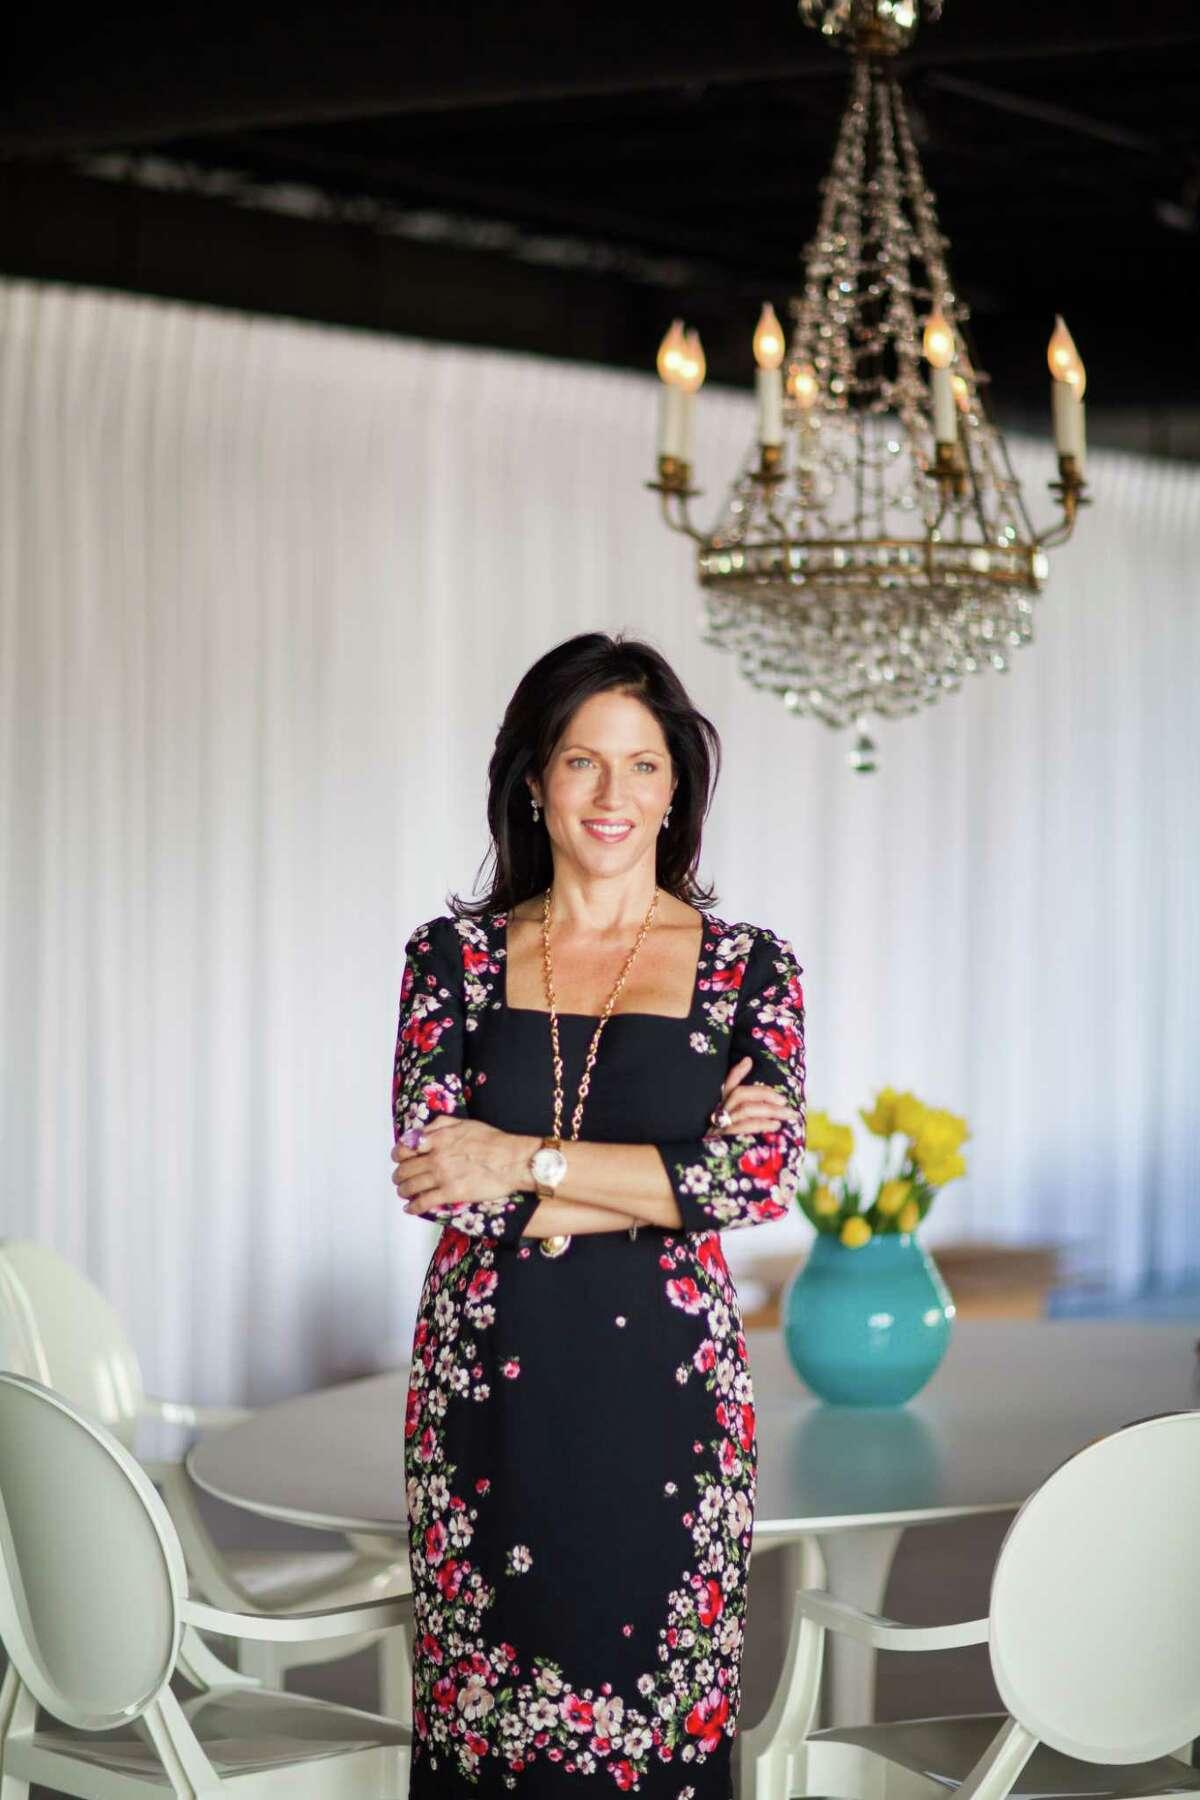 Karen Pulaski is the owner of Tribute Goods, a purveyor of luxurious and artful Italian linens.